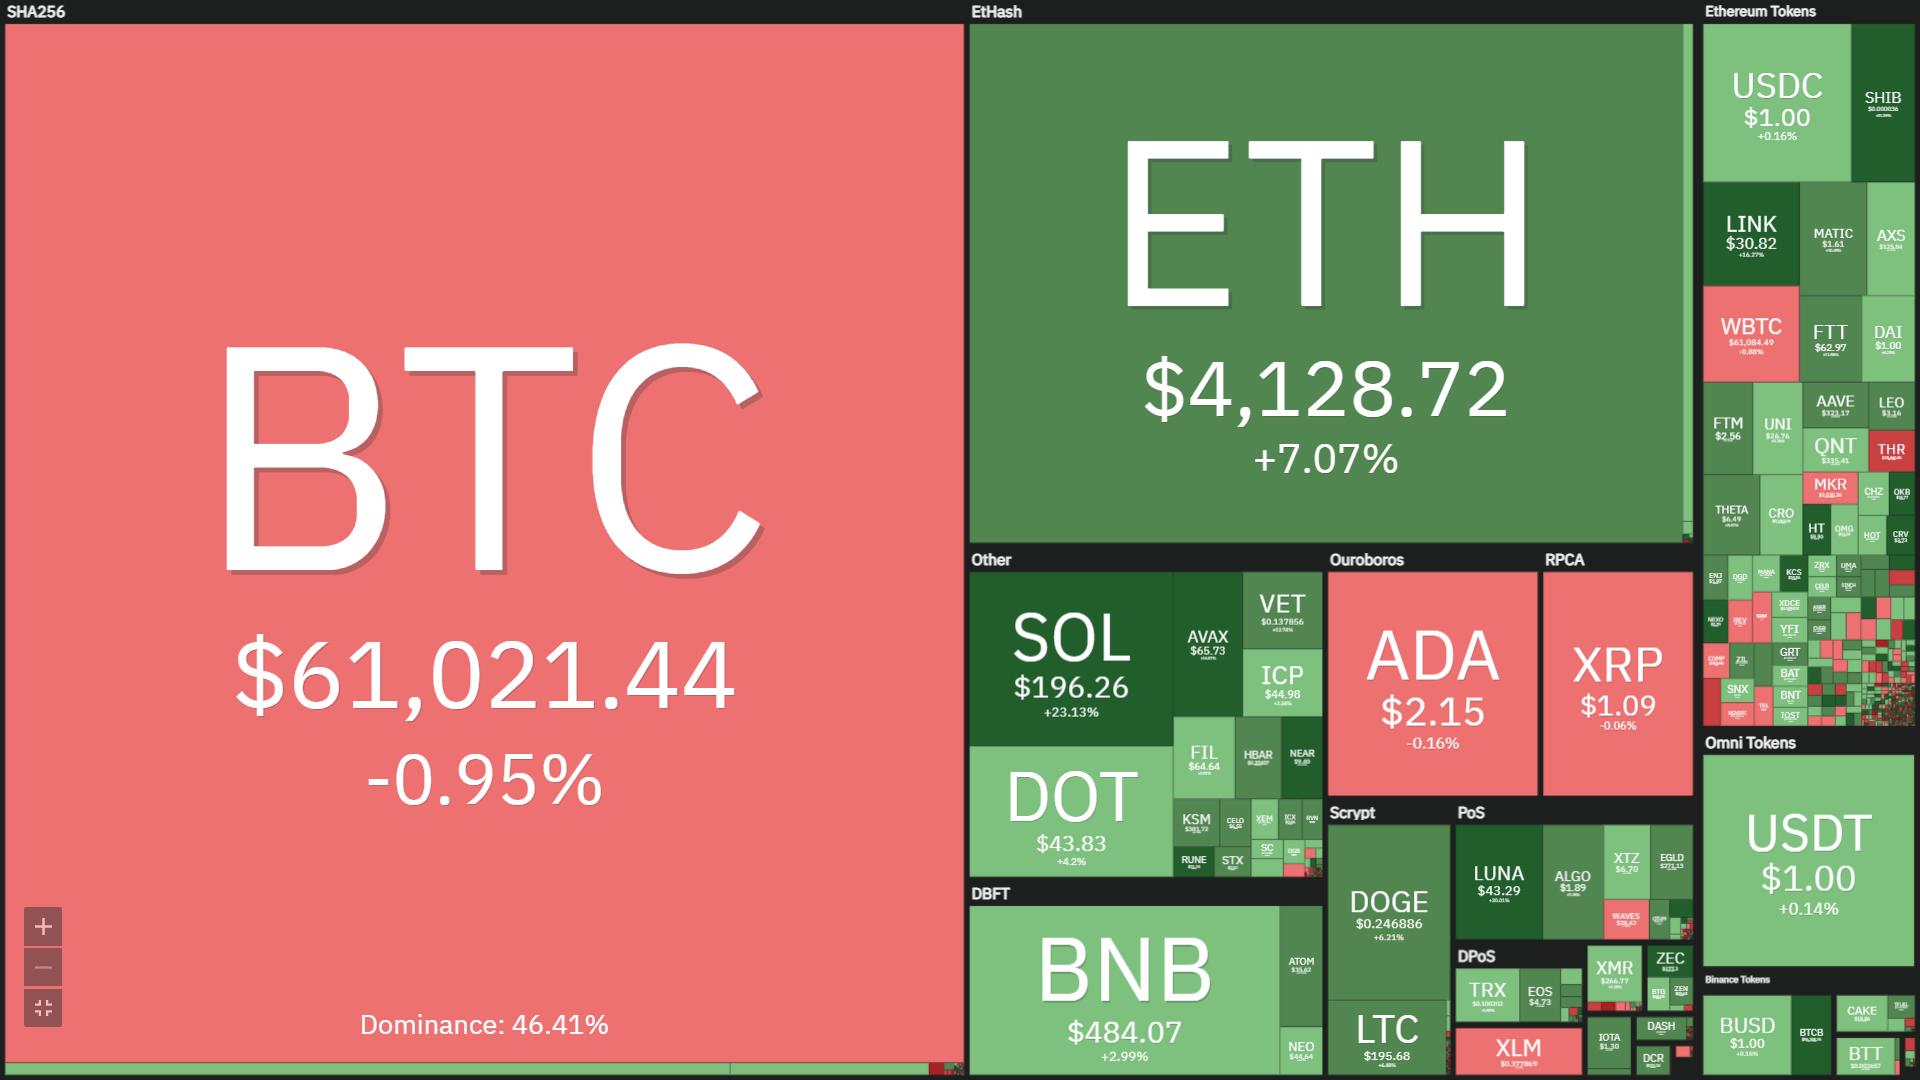 Tuần san Coin68 (18/10 – 24/10): Bitcoin và Ethereum lập đỉnh ATH mới